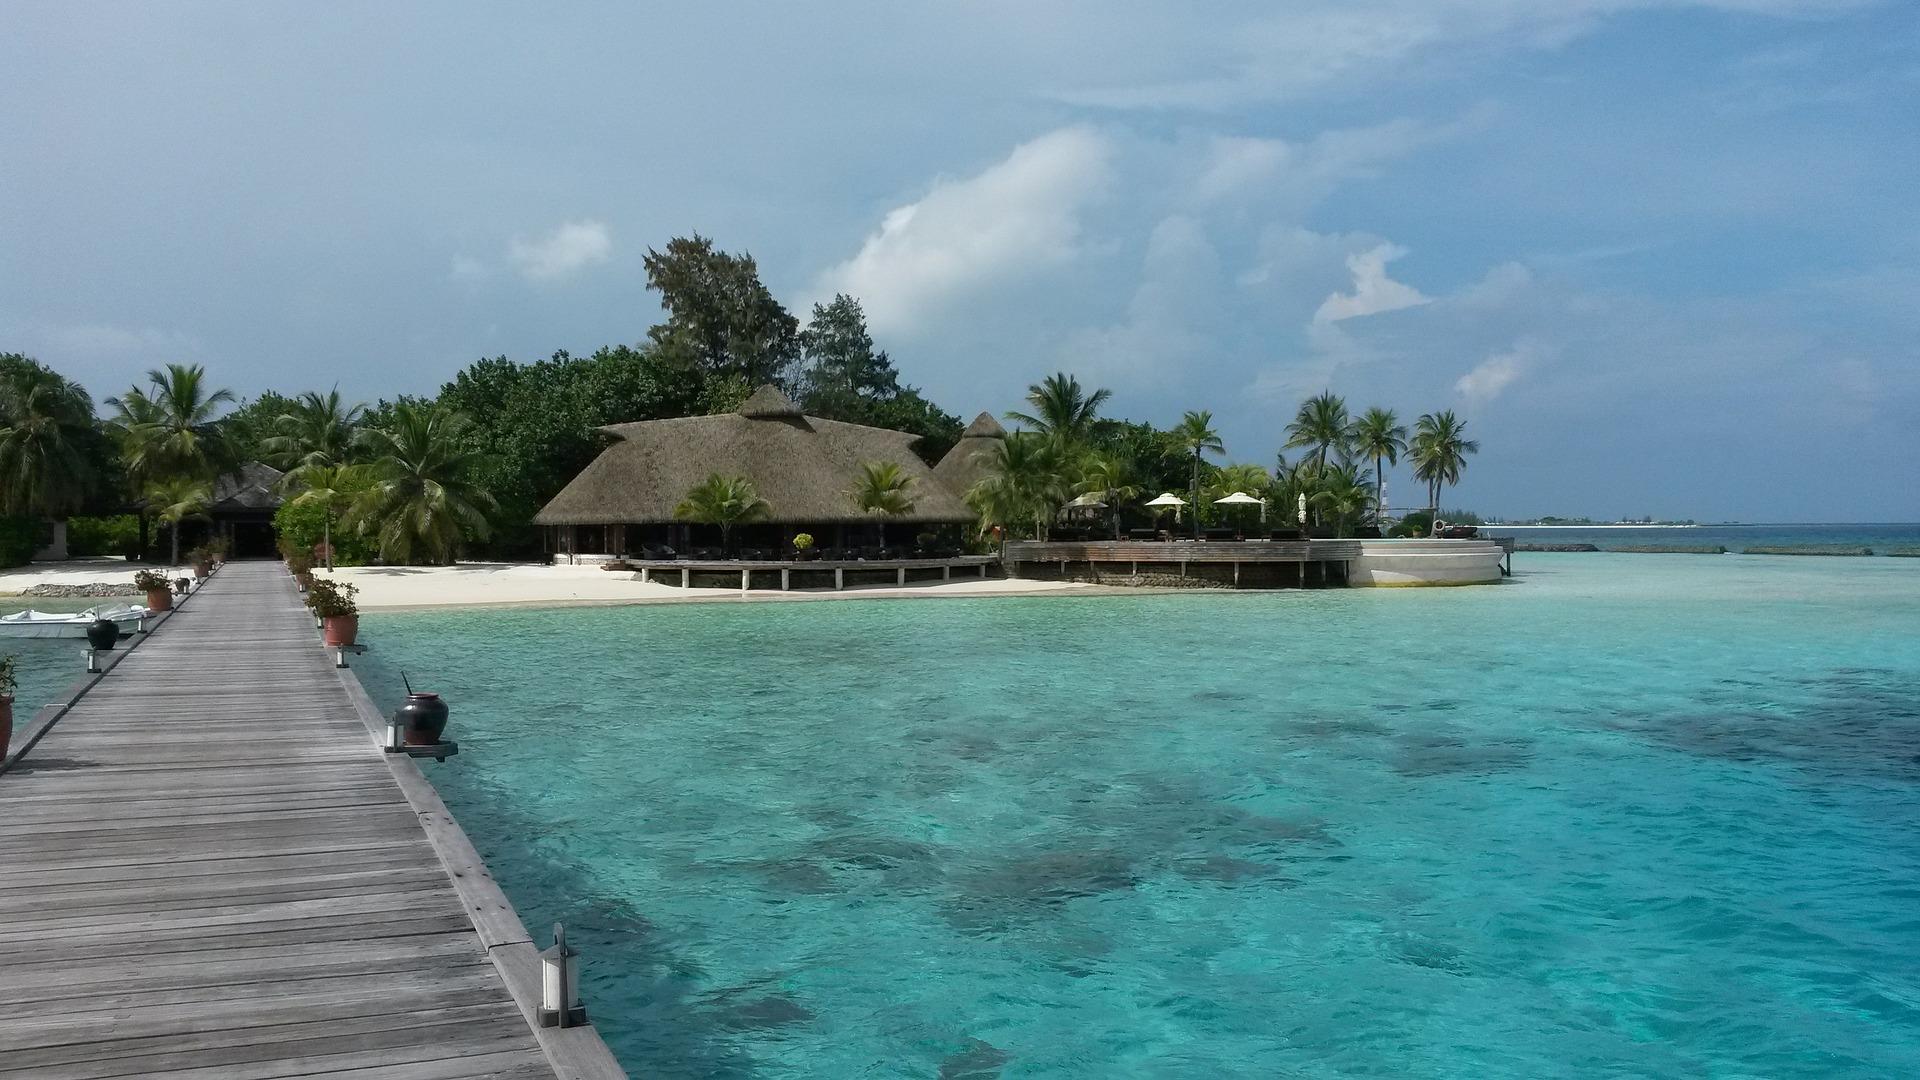 Komandoo, Maldives Islands, Maldives